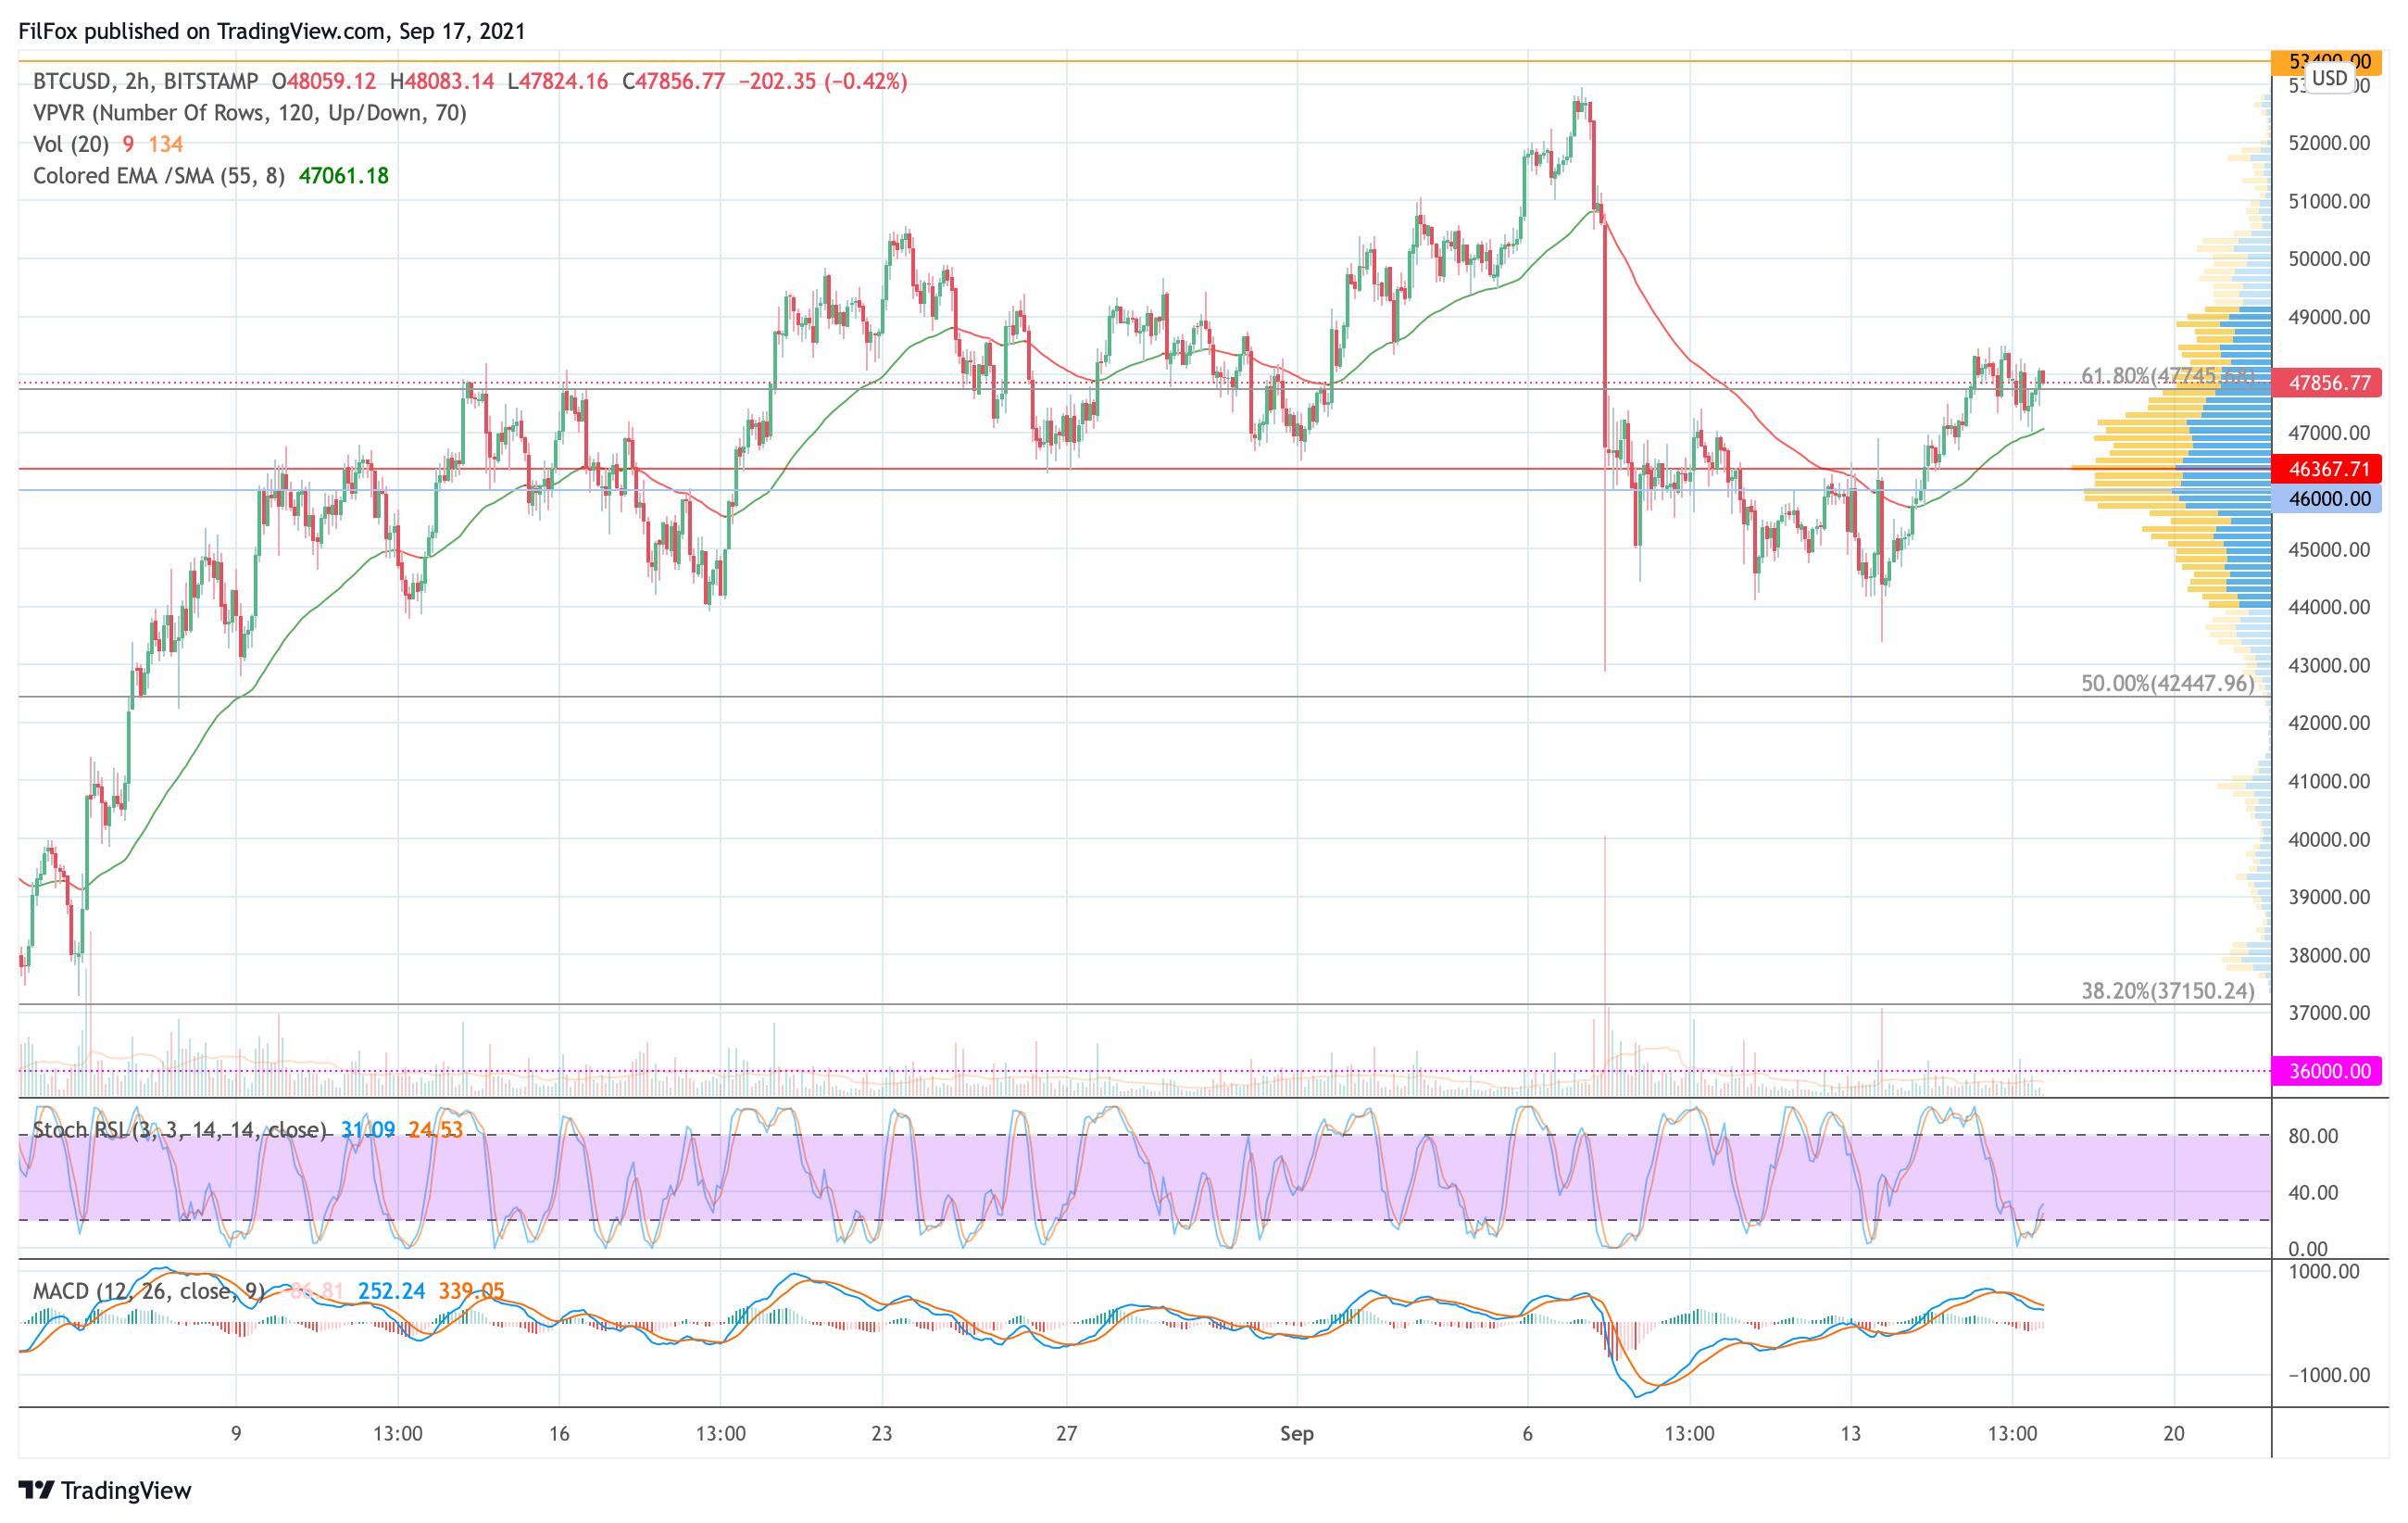 Анализ цен BTC, ETH, XRP (17.09.21)